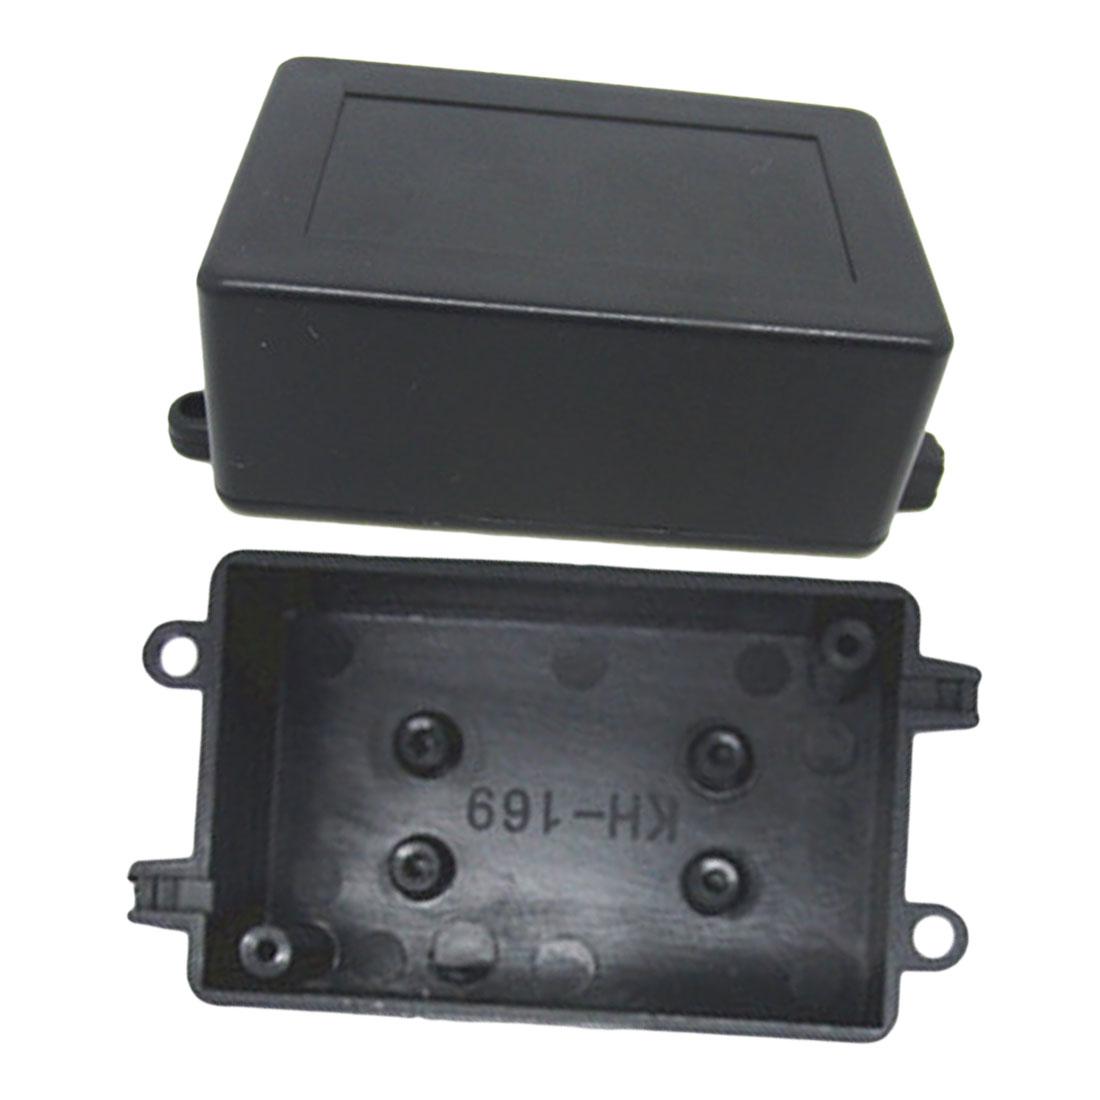 Caja de instrumentos negra de 70x45x30 MM, caja de Proyecto de caja electrónica de plástico impermeable